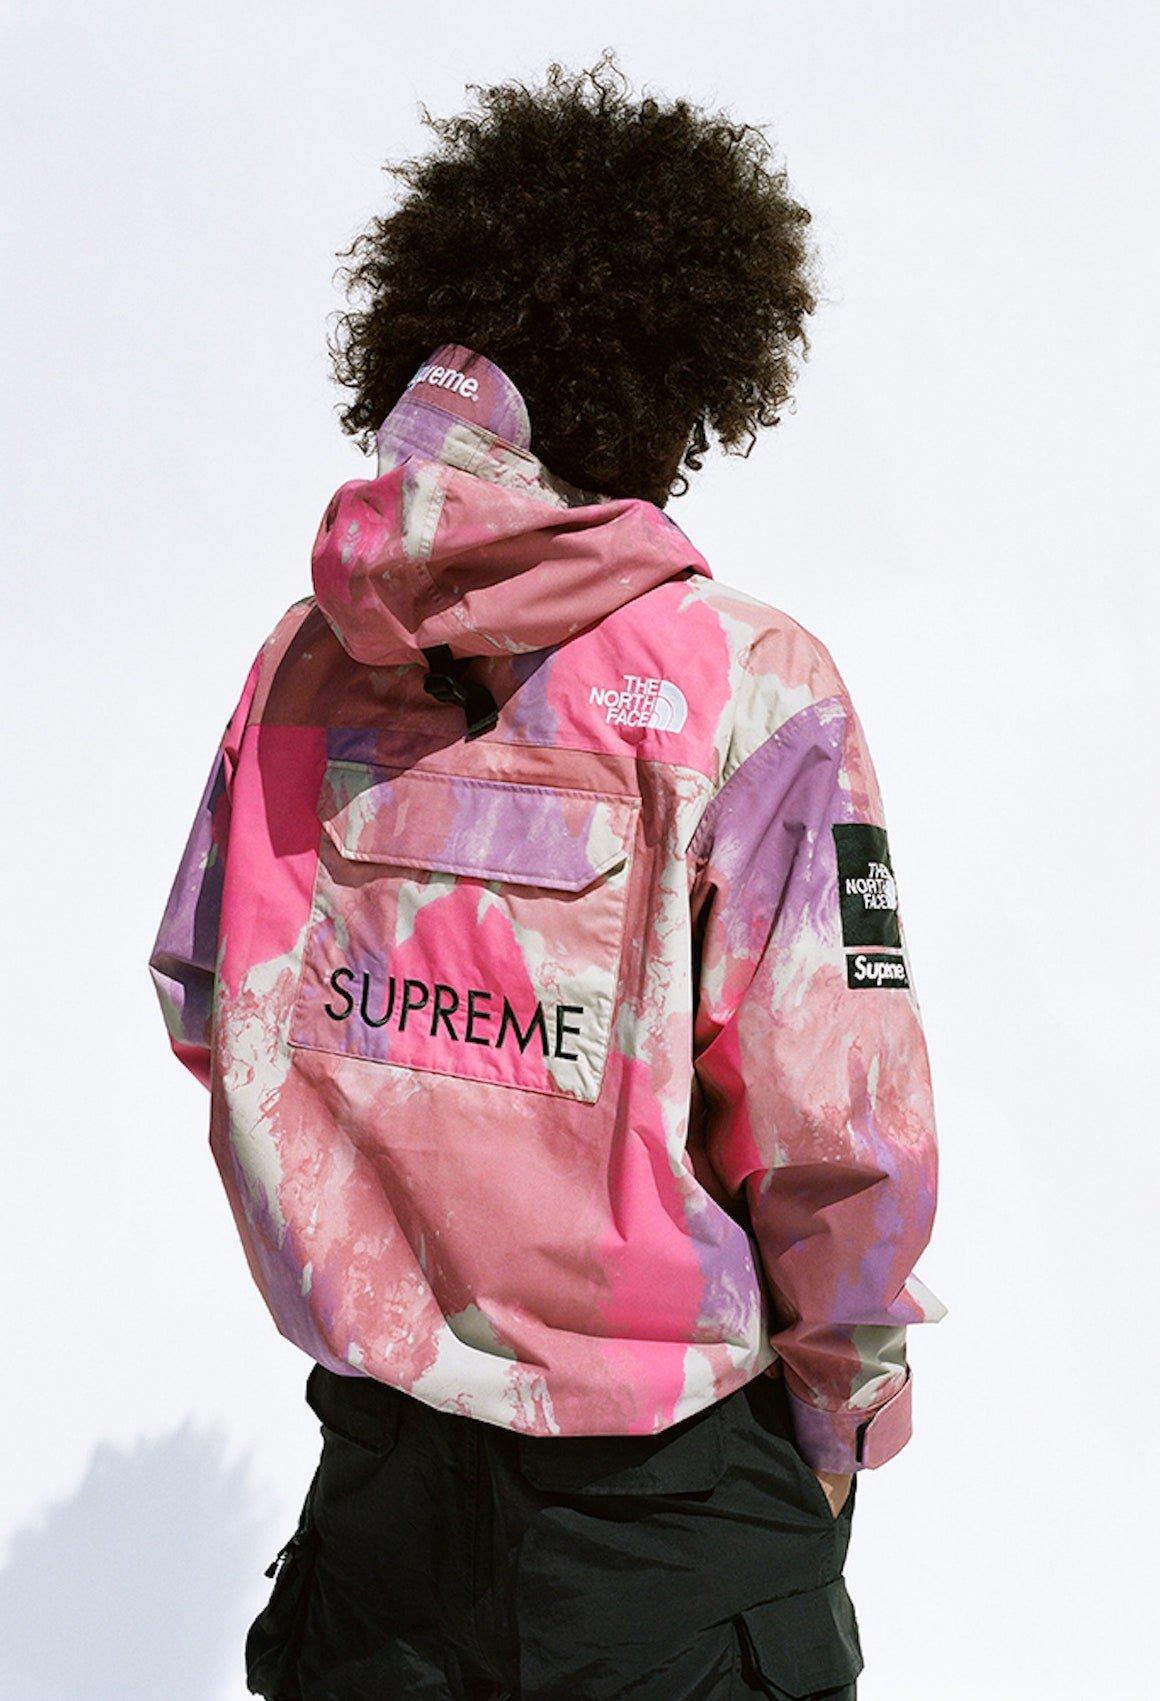 Supreme X The North Face Collaborations